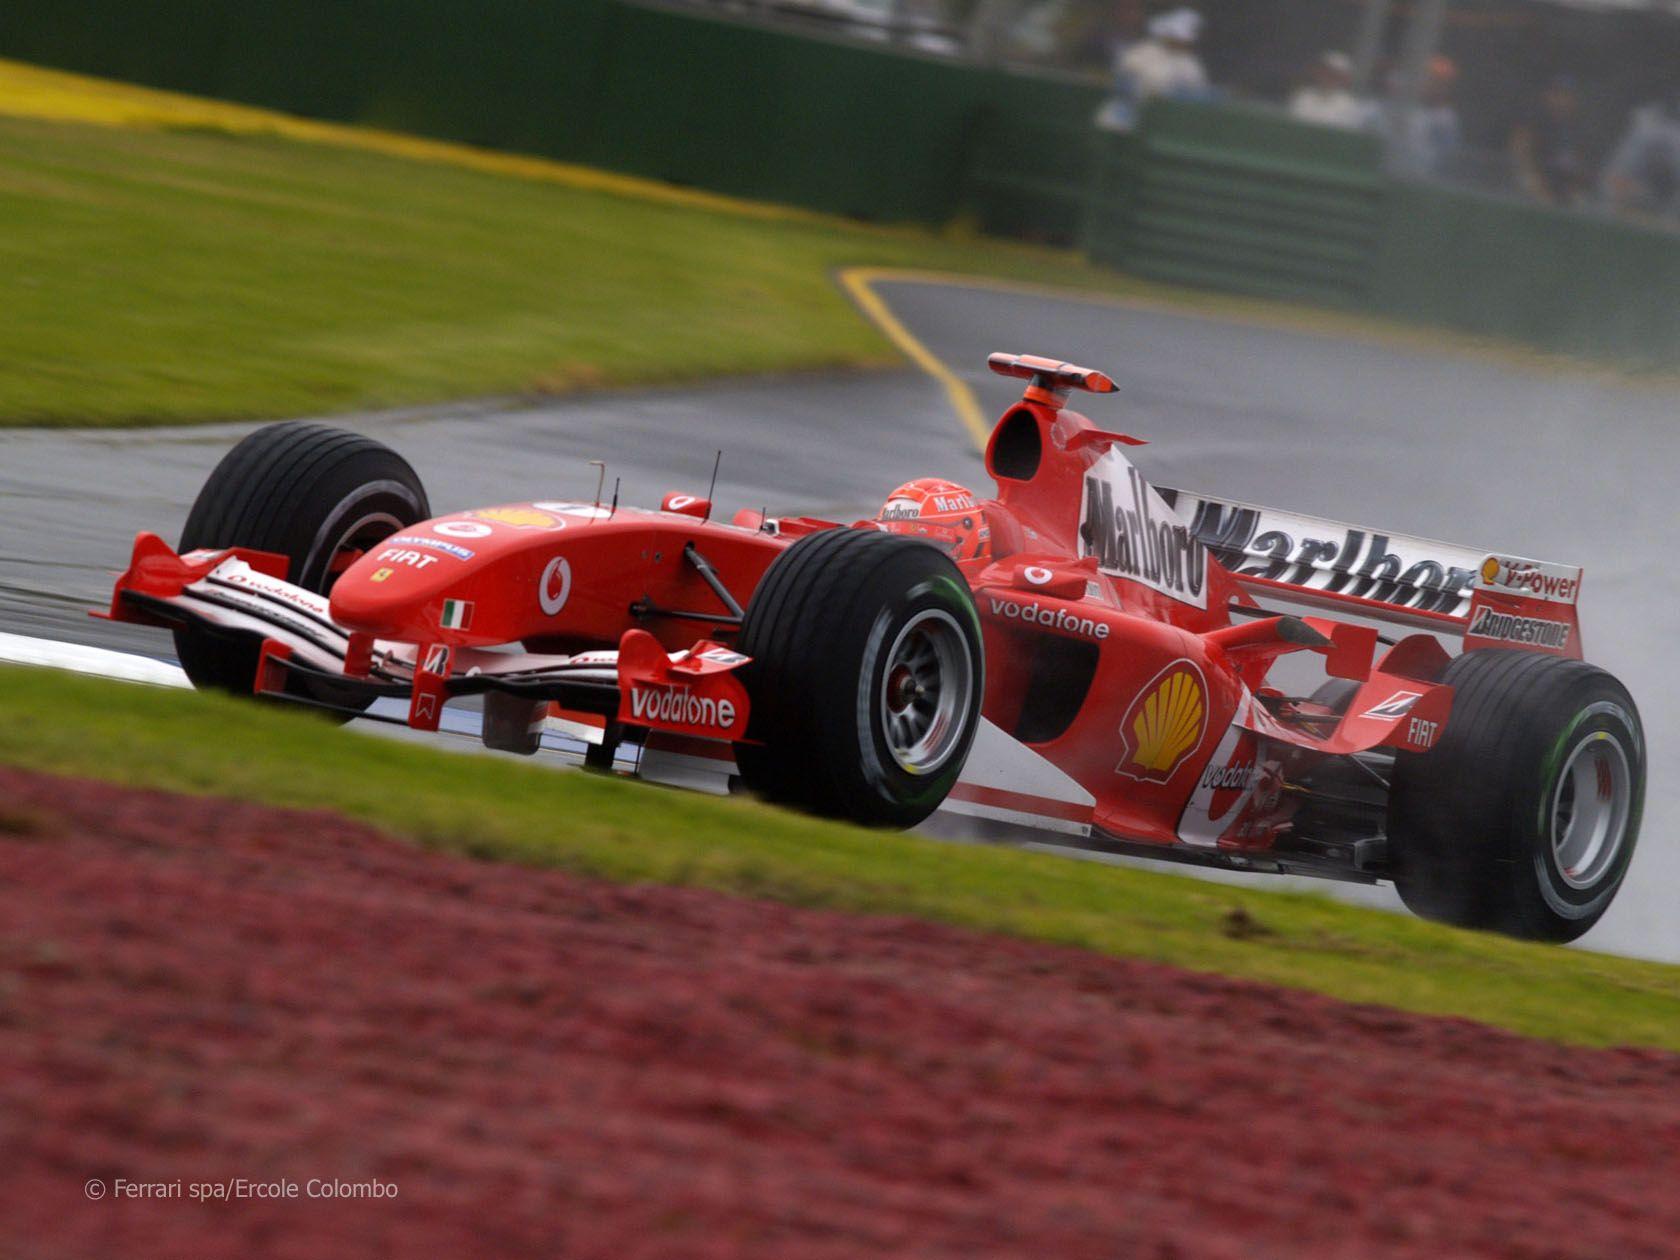 Michael Schumacher, Ferrari F2005, Melbourne, 2005 | Ferrari, Michael  schumacher, Schumacher